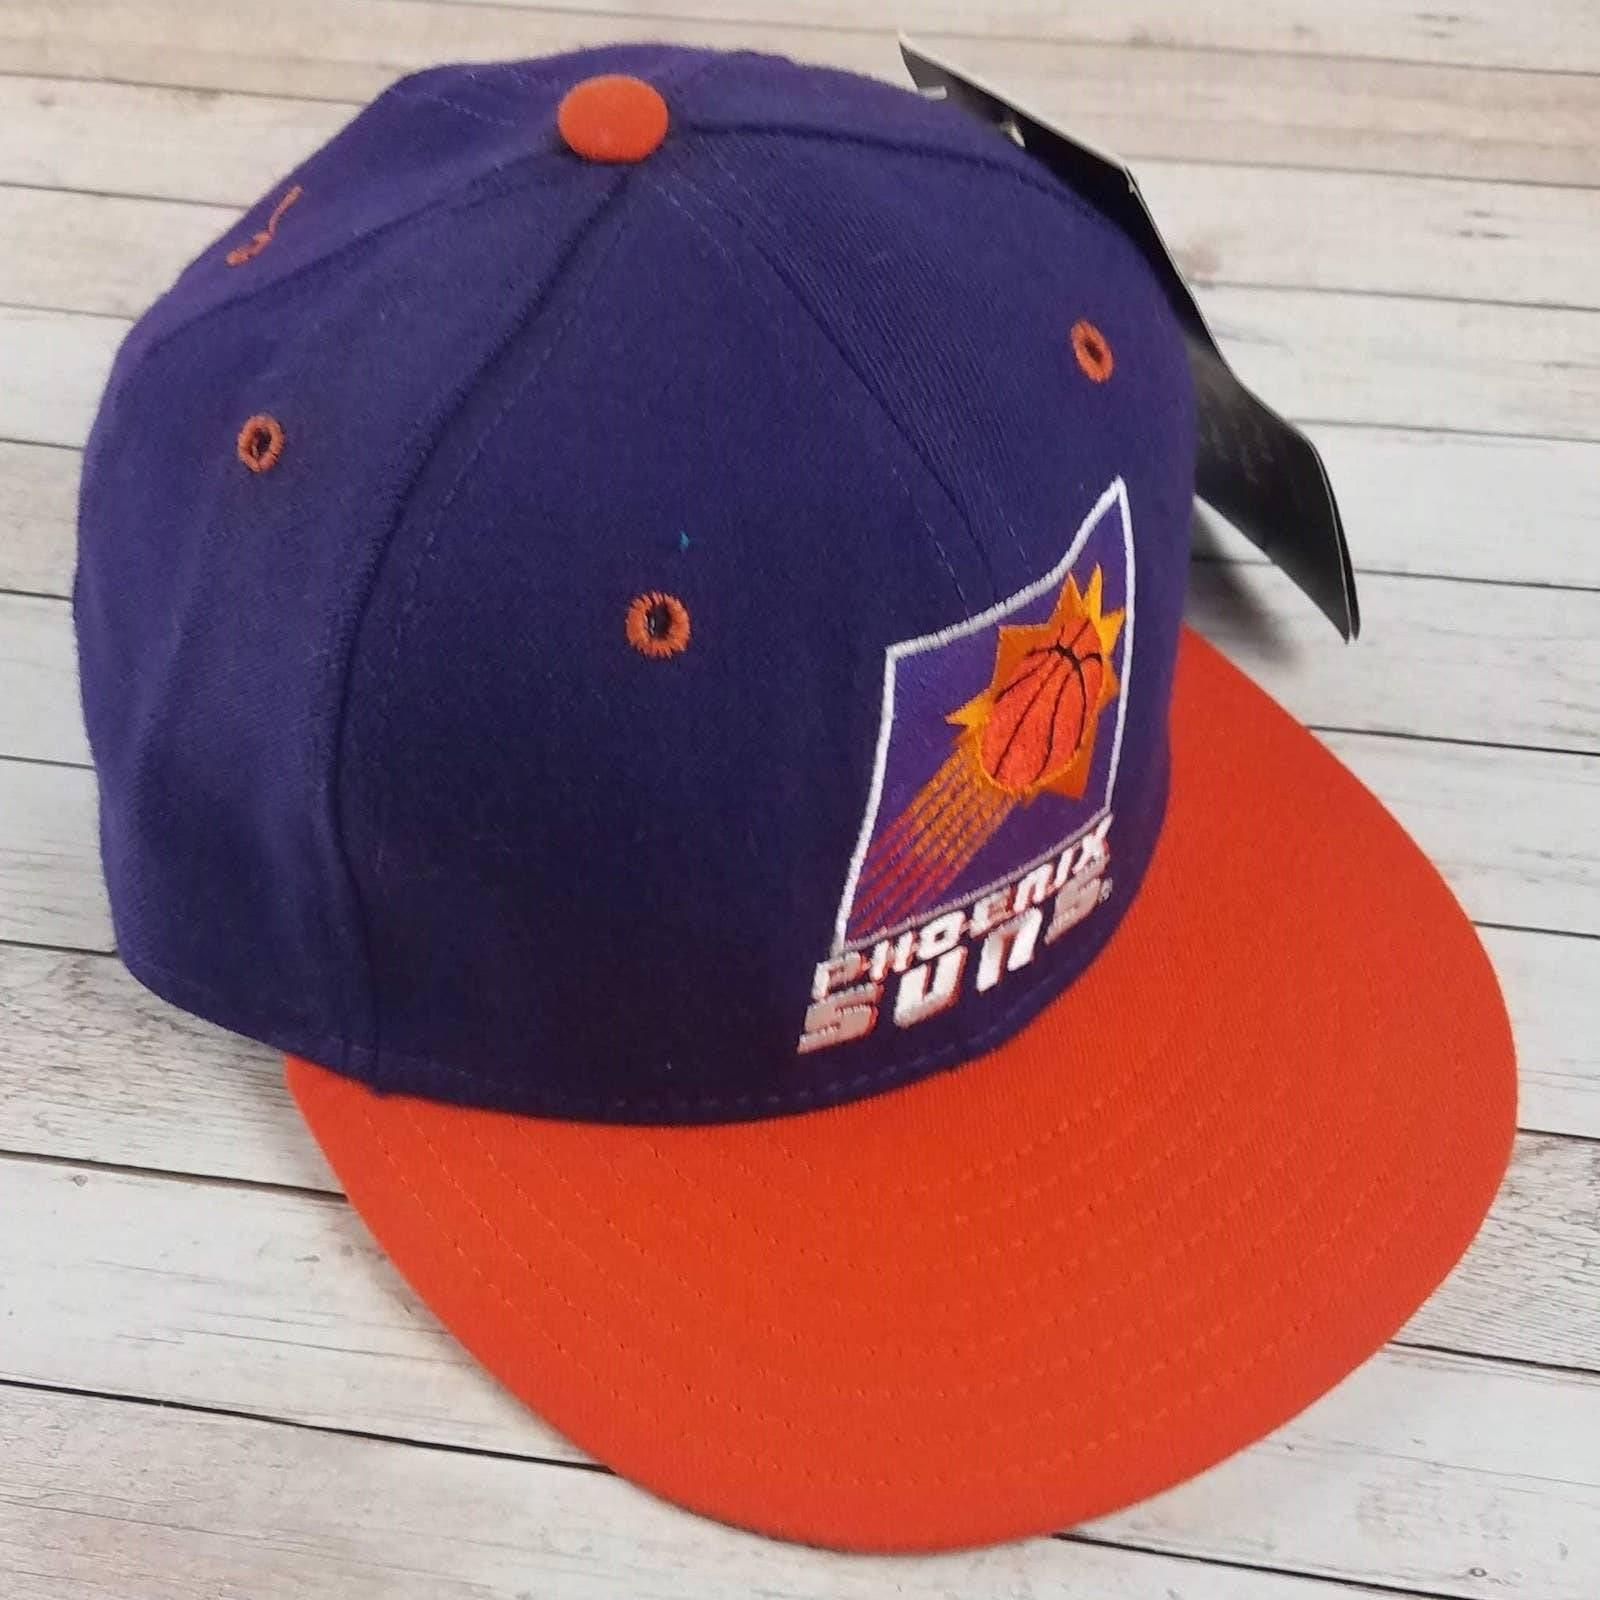 VTG 90s Phoenix Suns New Era Fitted Hat